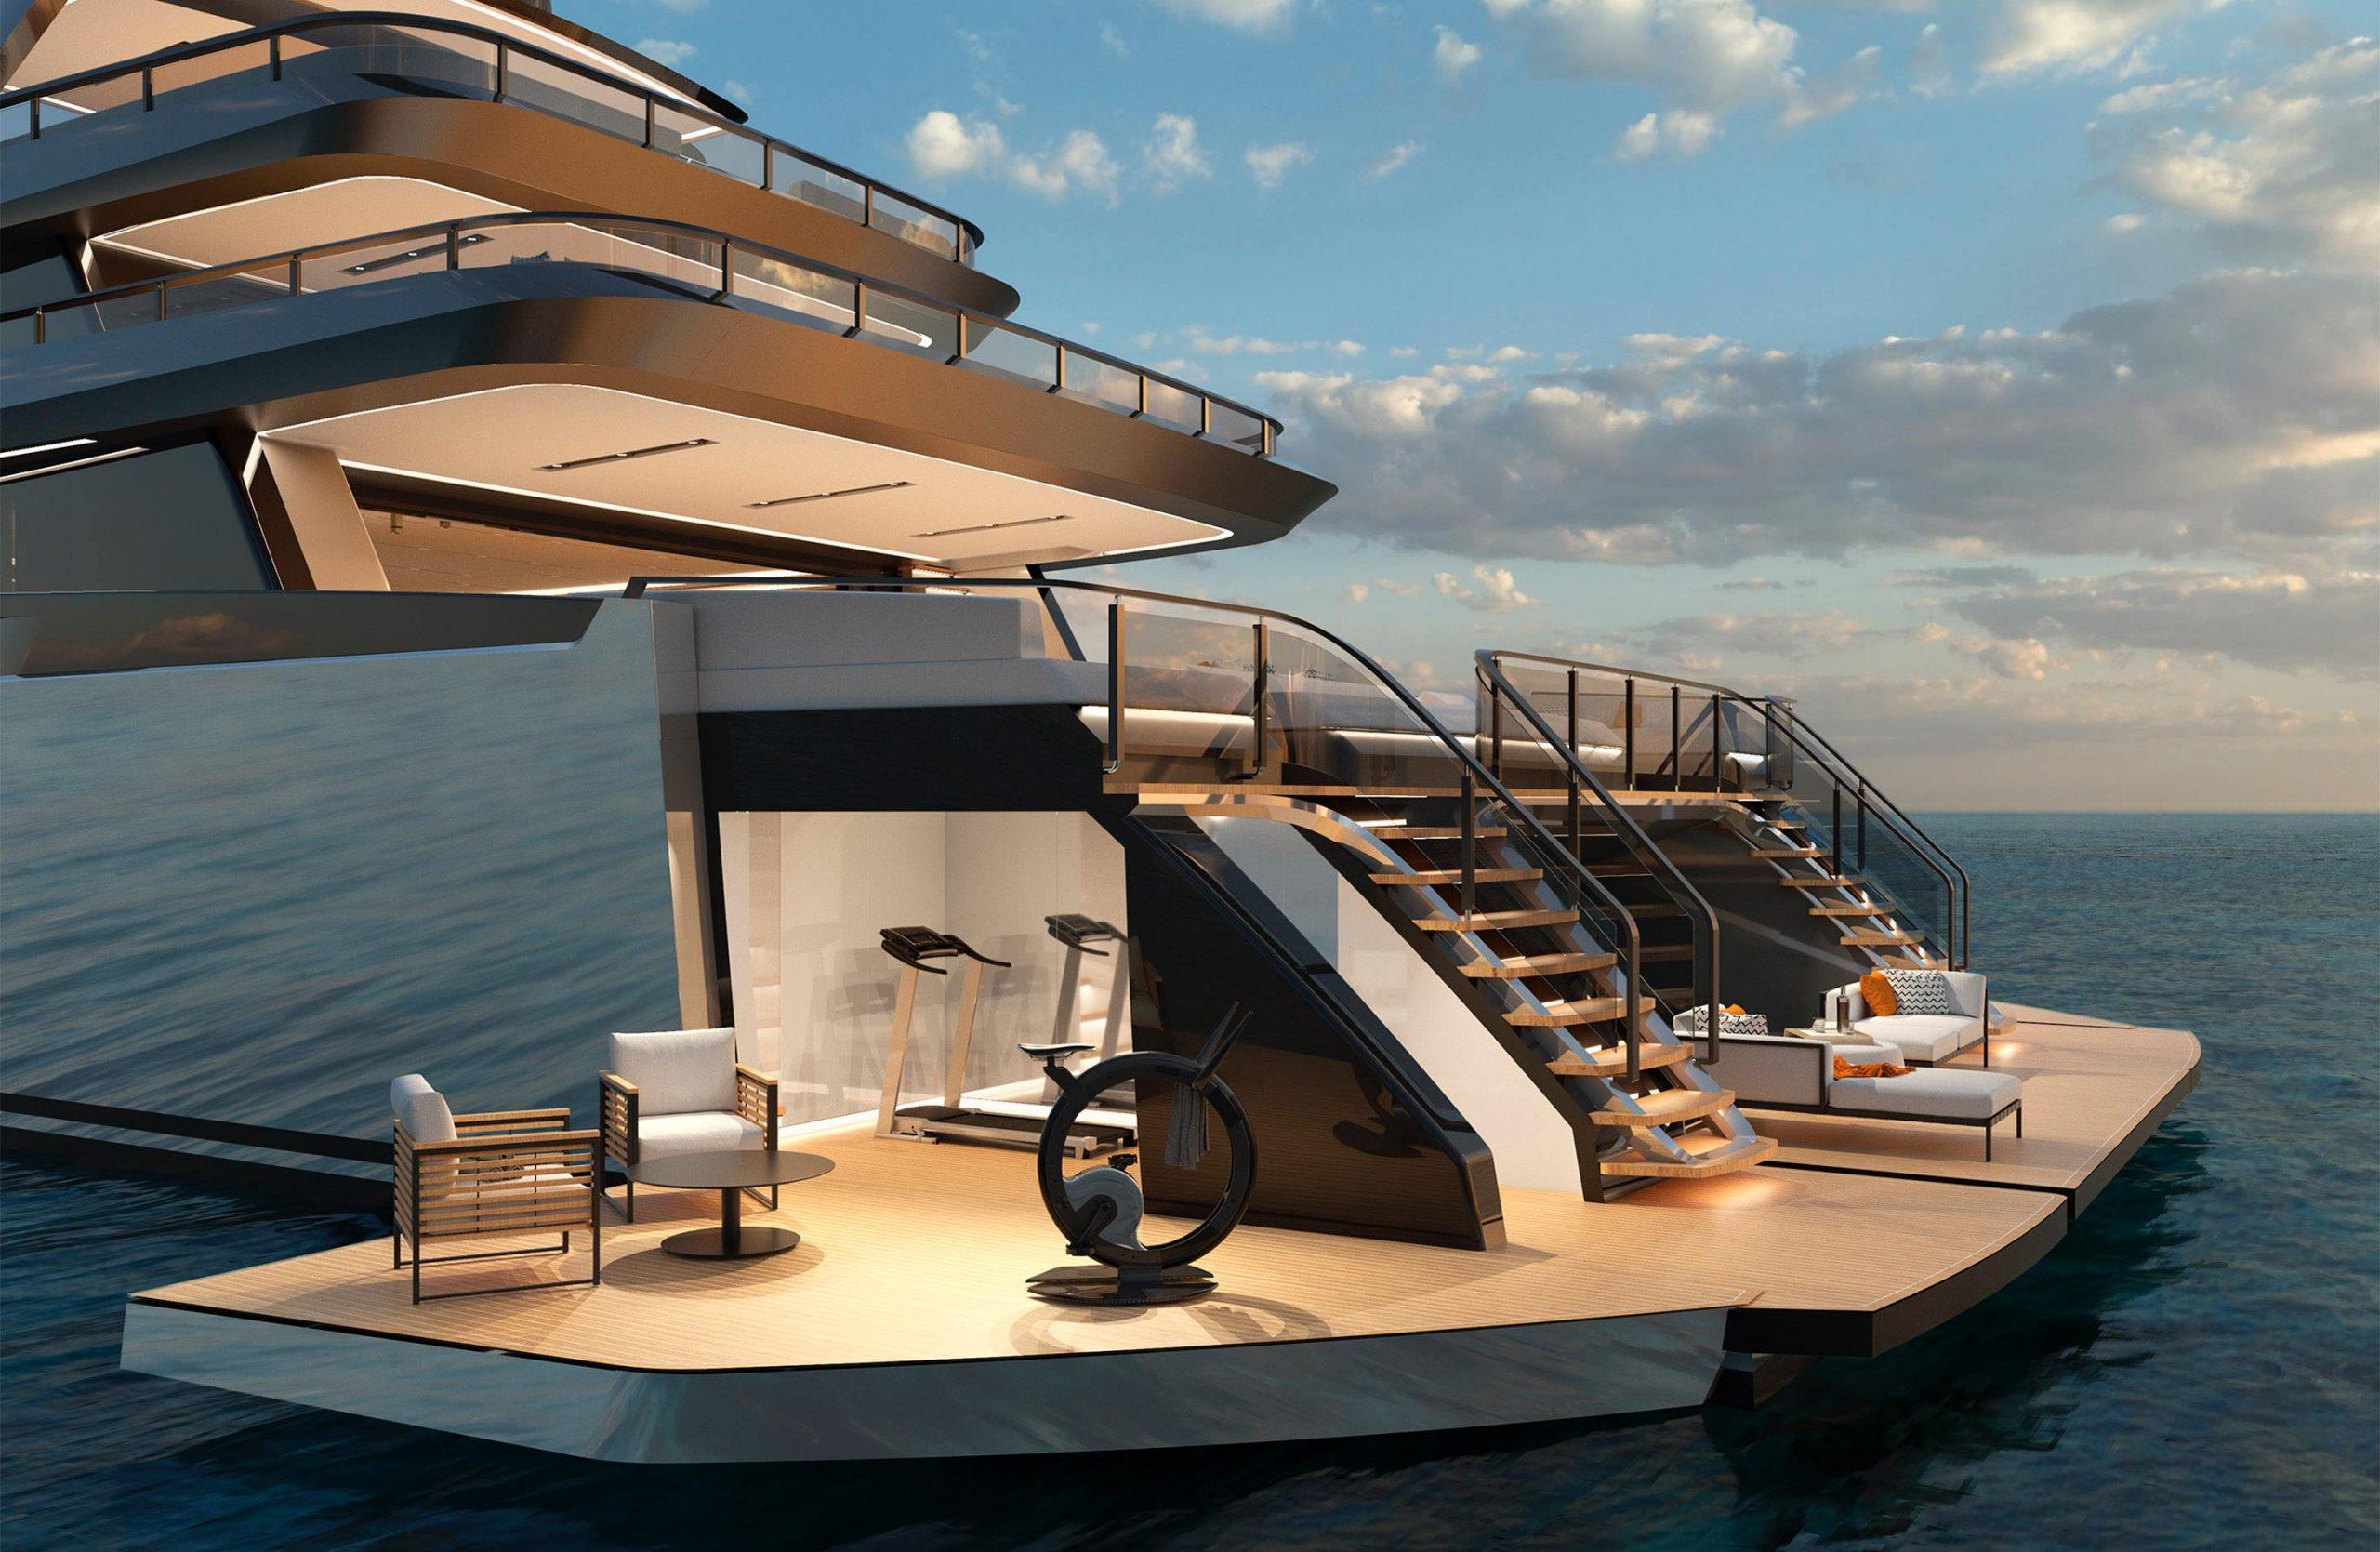 ISA Yachts Zeffiro folding beach club with gym